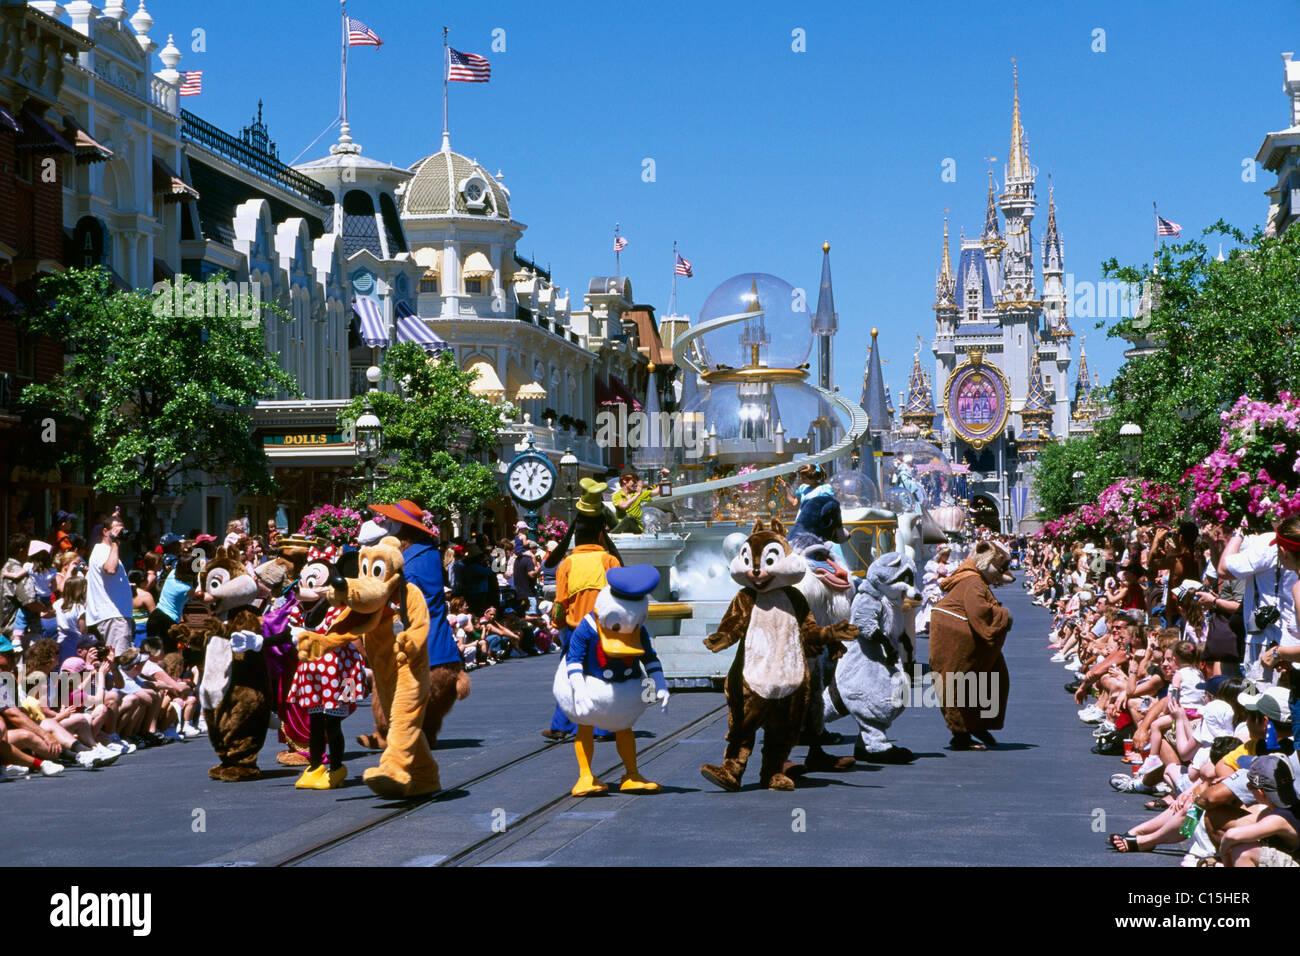 Magic Kingdom, Disneyworld, Disney World, Orlando, Florida, USA Stock Photo